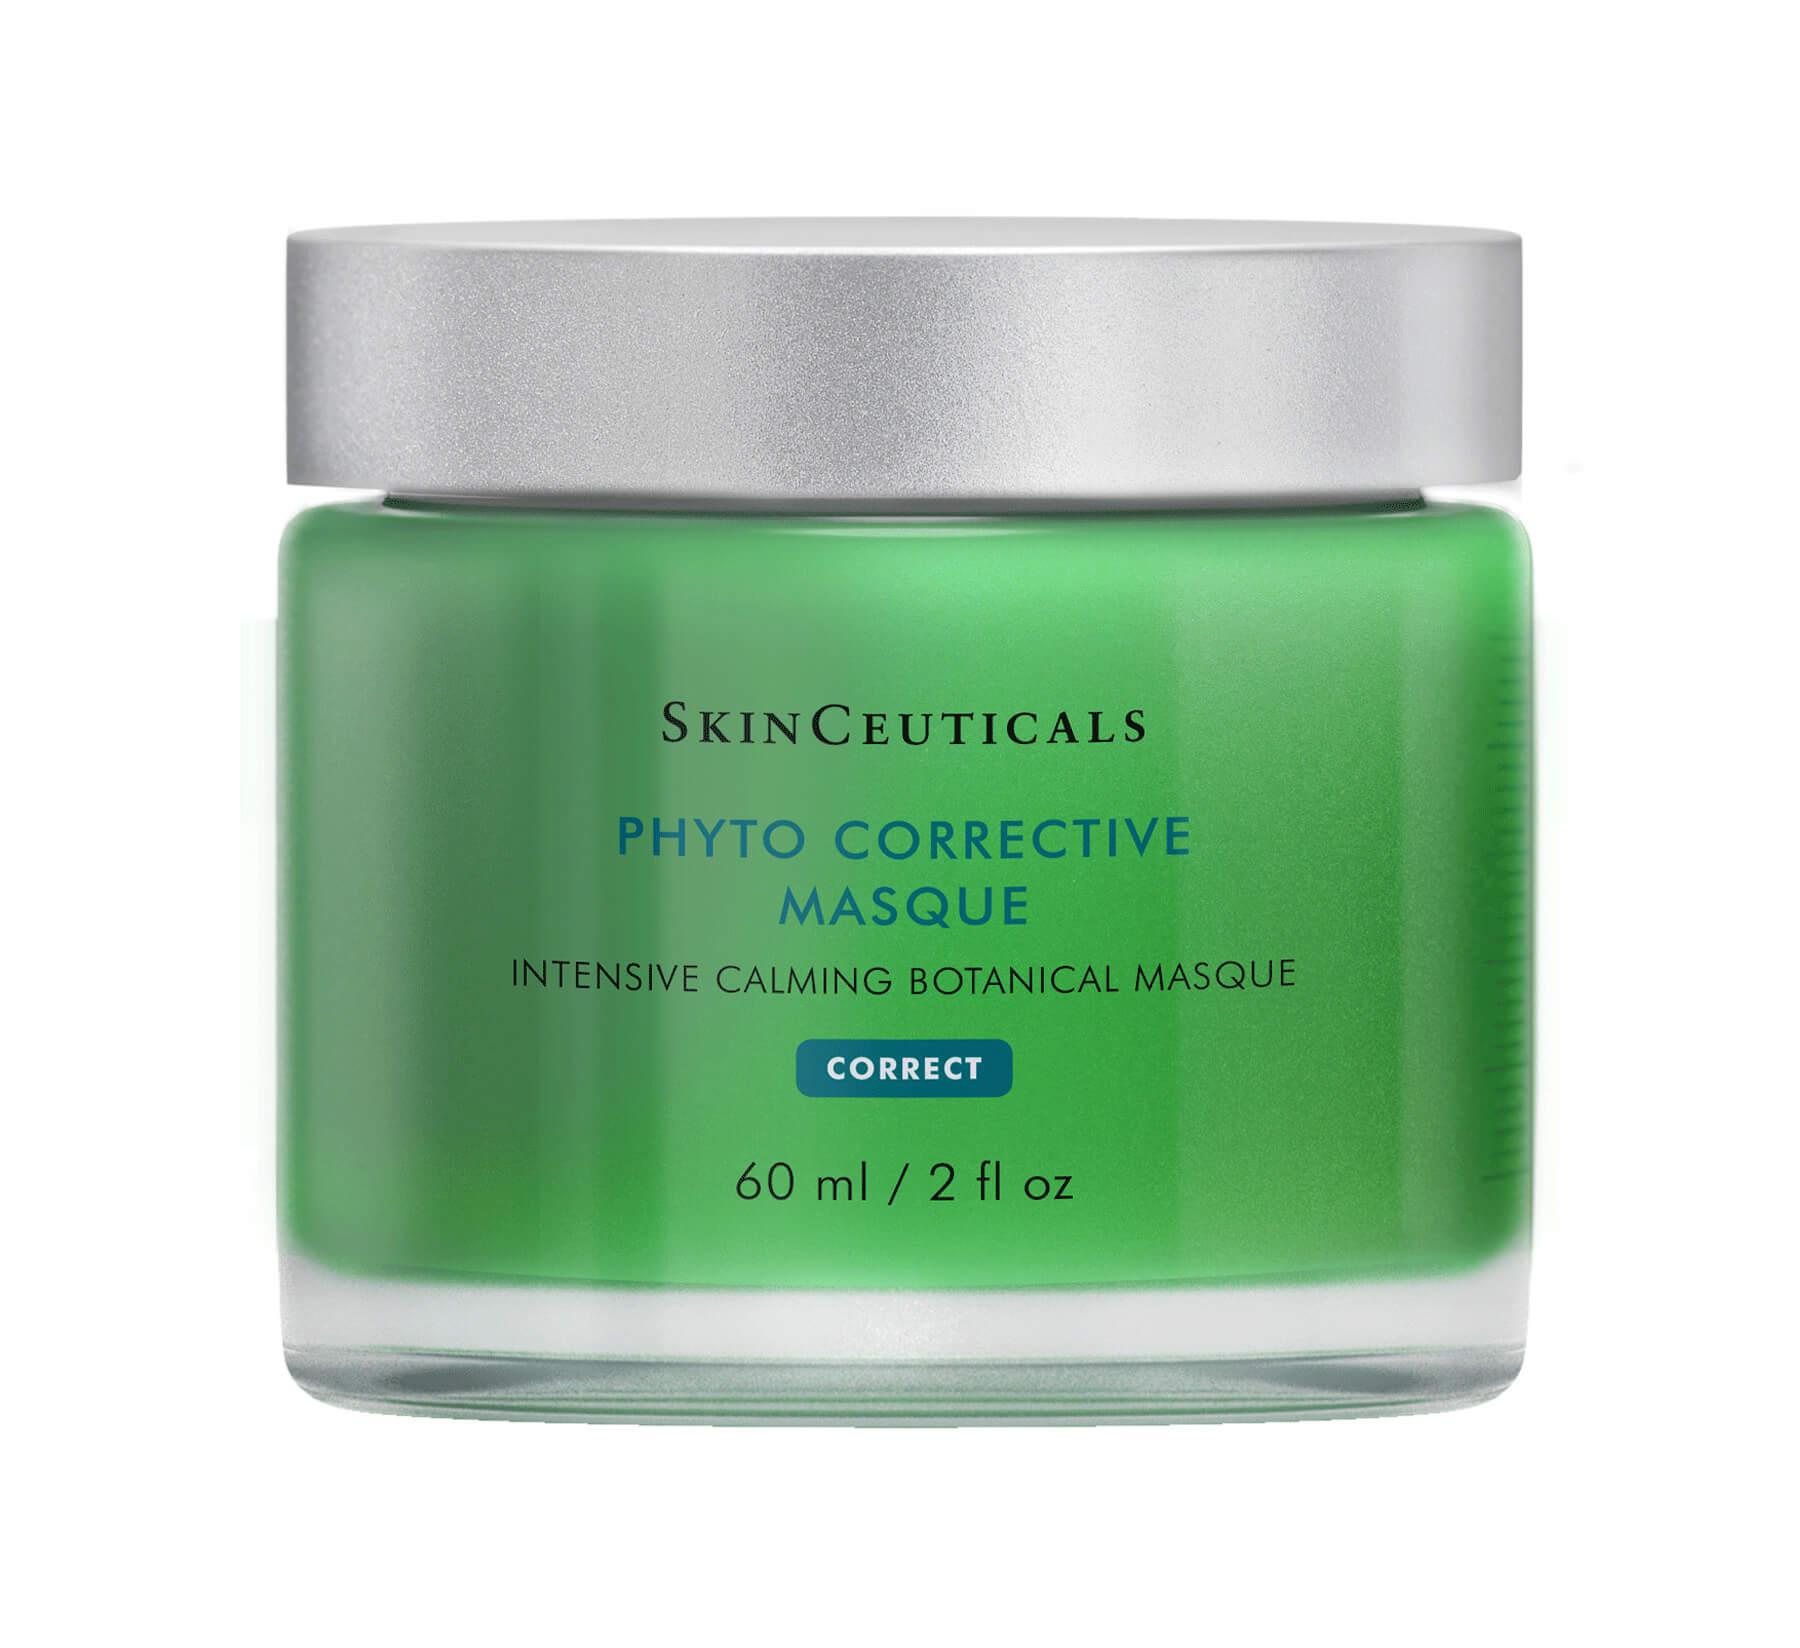 SkinCeuticals Phyto Corrective Masque.jpg